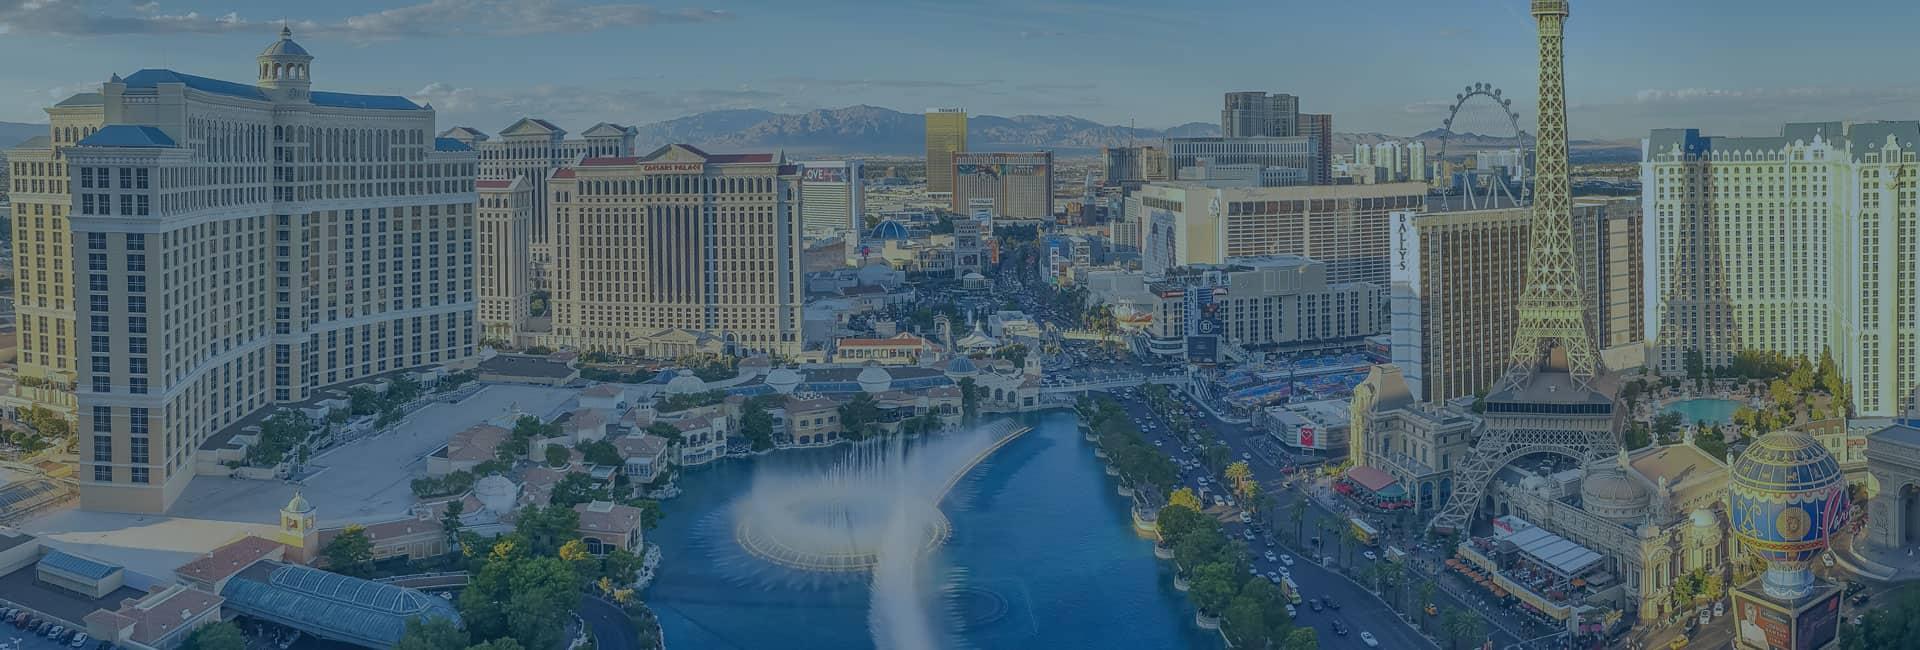 Nevada Senate Bill 287